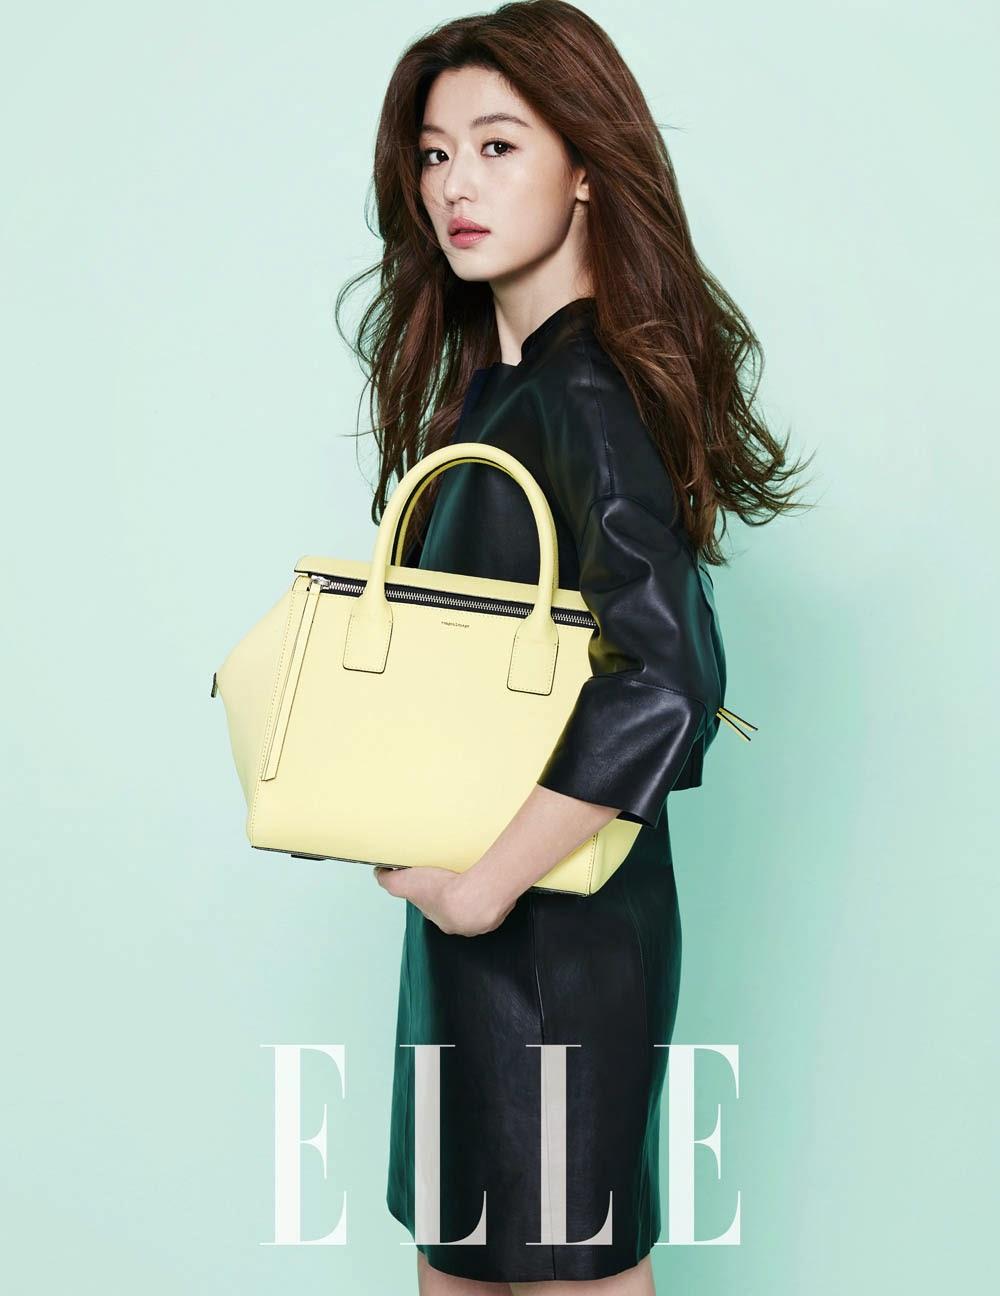 Jeon Ji Hyun - Elle Magazine February Issue 2014